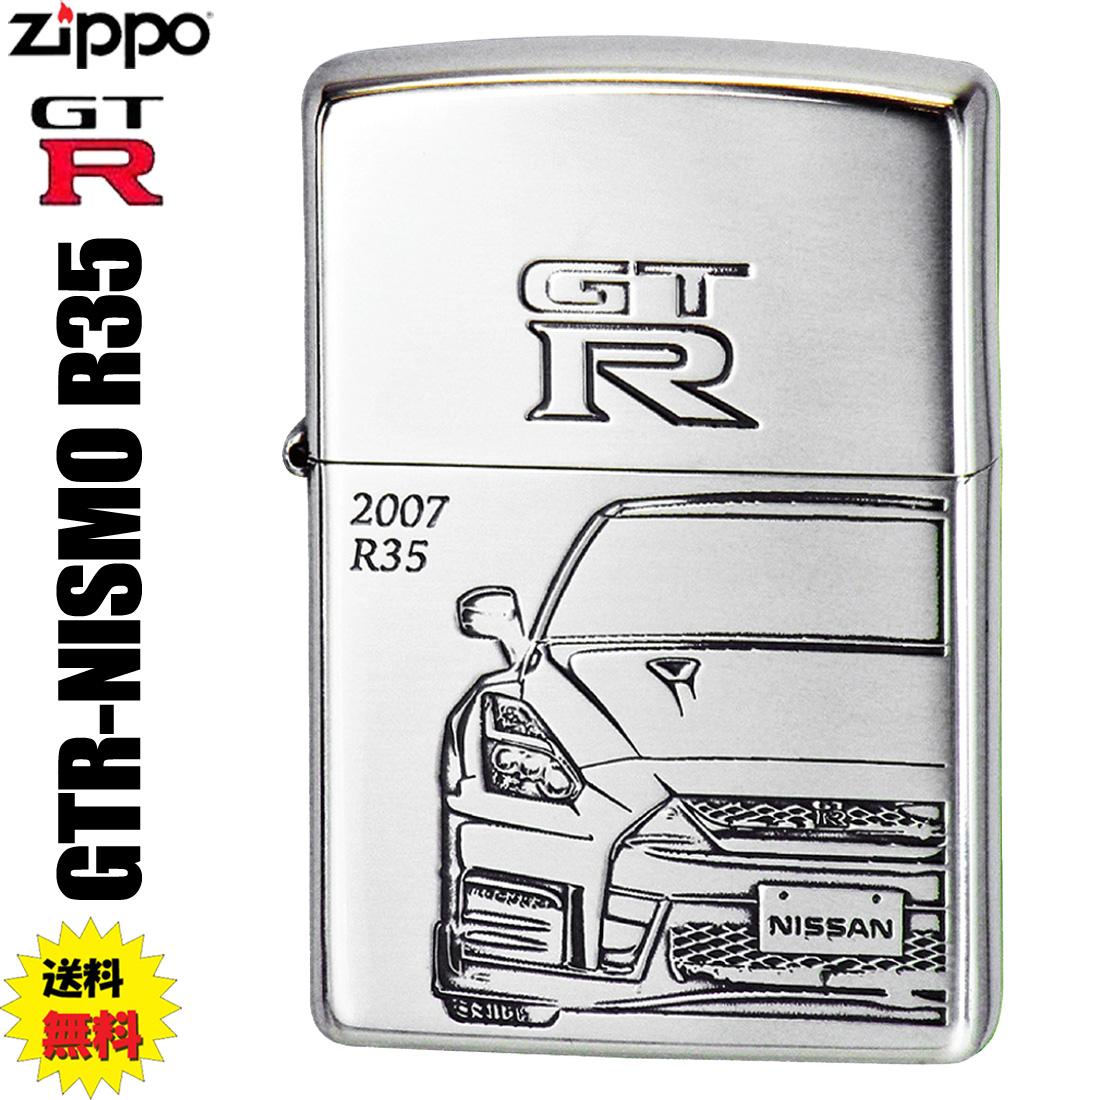 ZIPPO/NISSAN GT-R NISMO [ R35 ]  限定 日産公認 シルバーイブシ シリアルナンバー入り画像